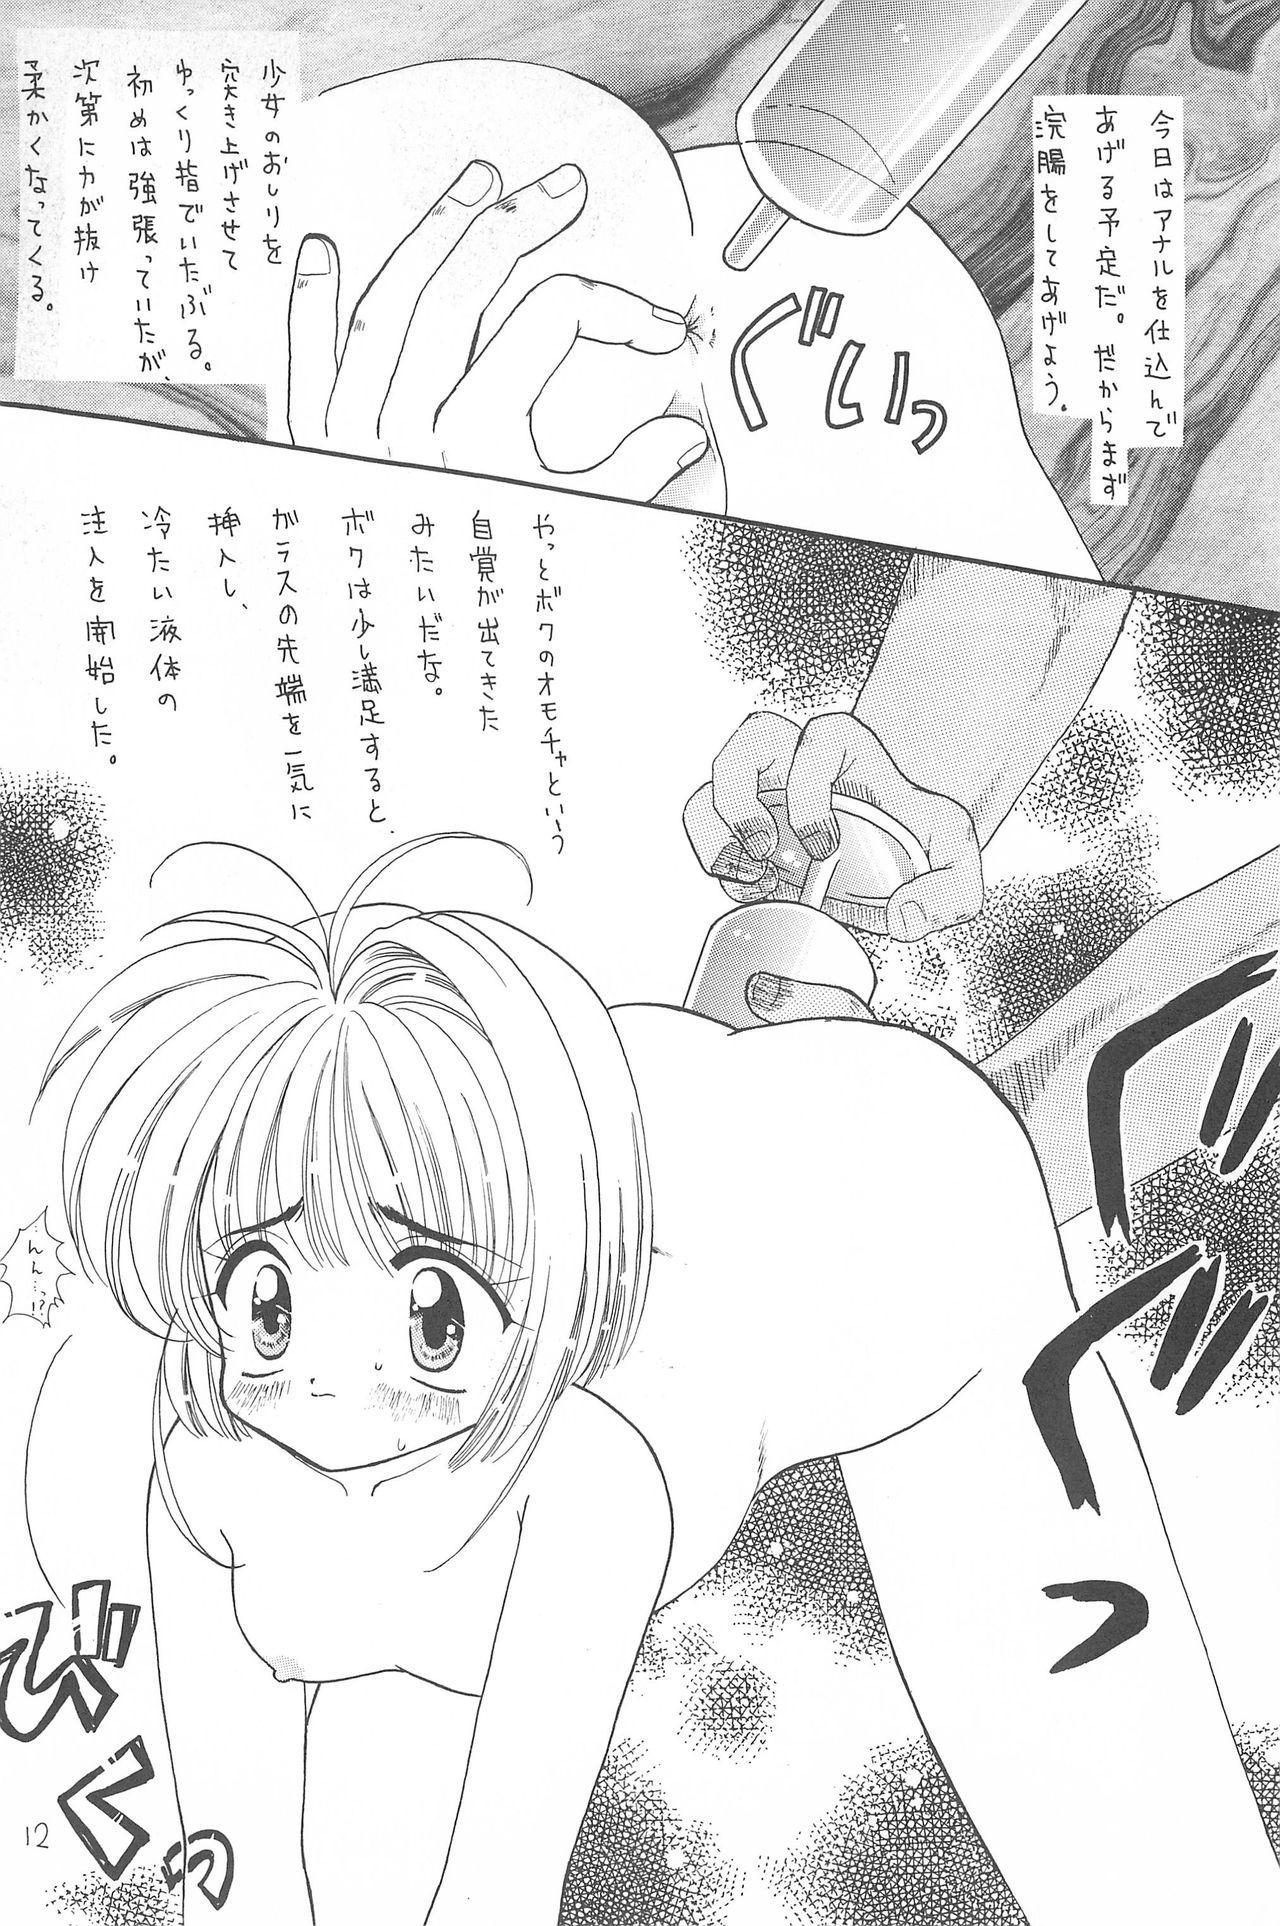 Shoujo Kougaku 11